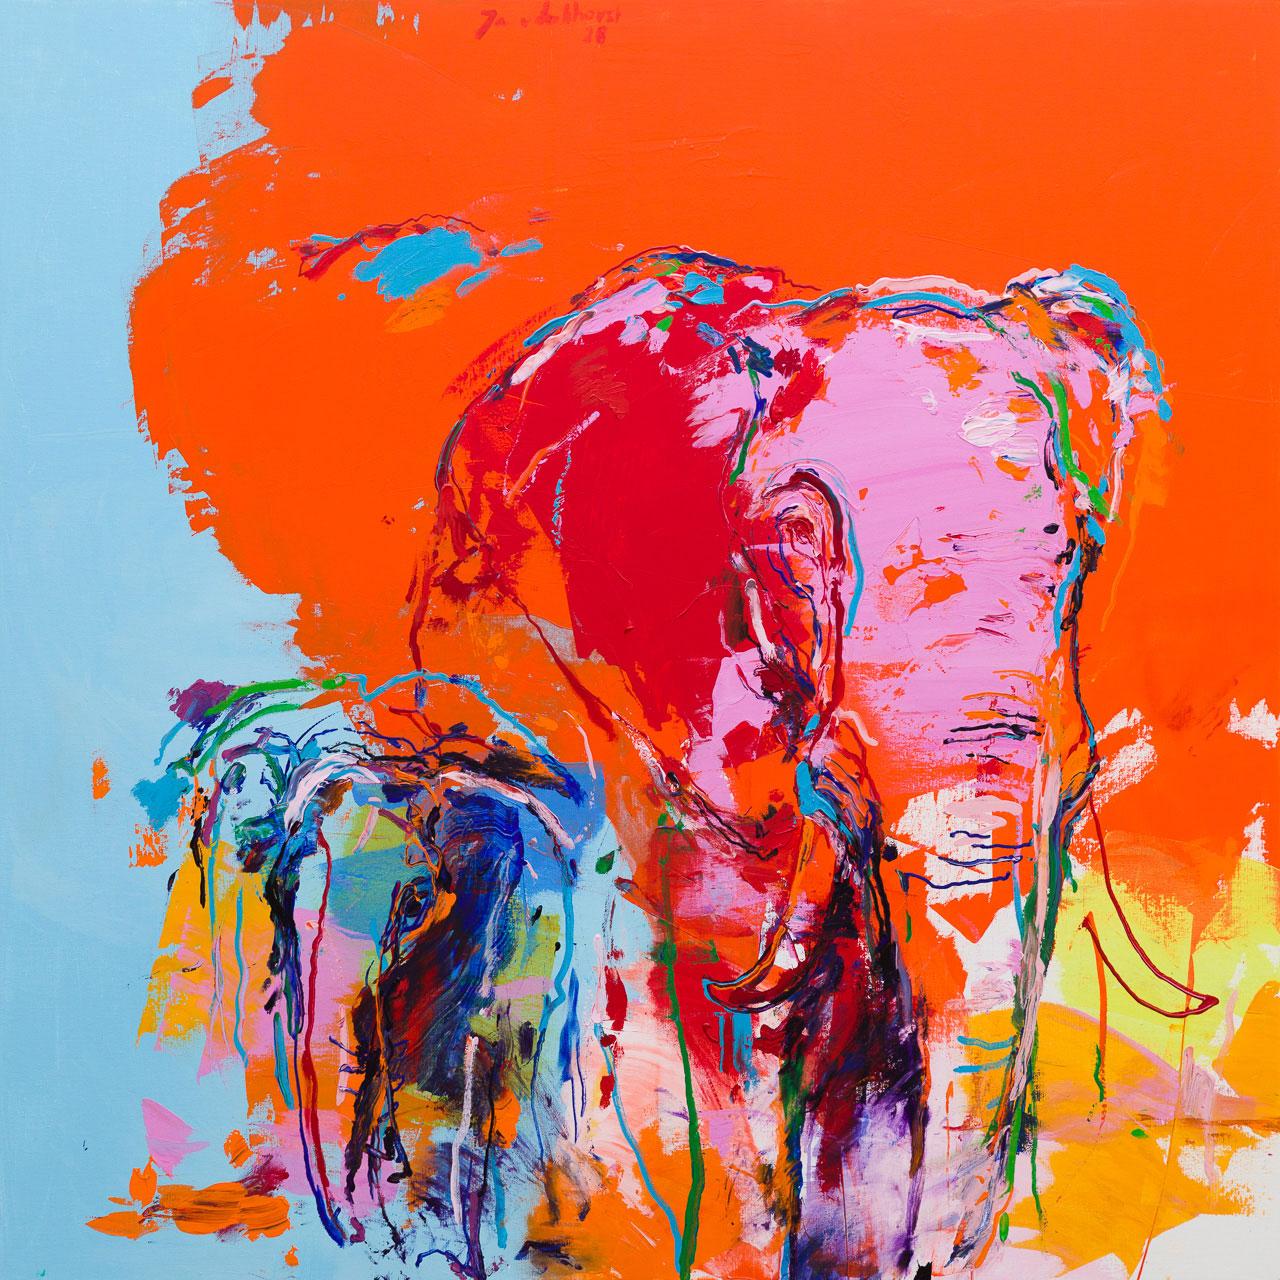 Schilderij olifanten oranje blauw